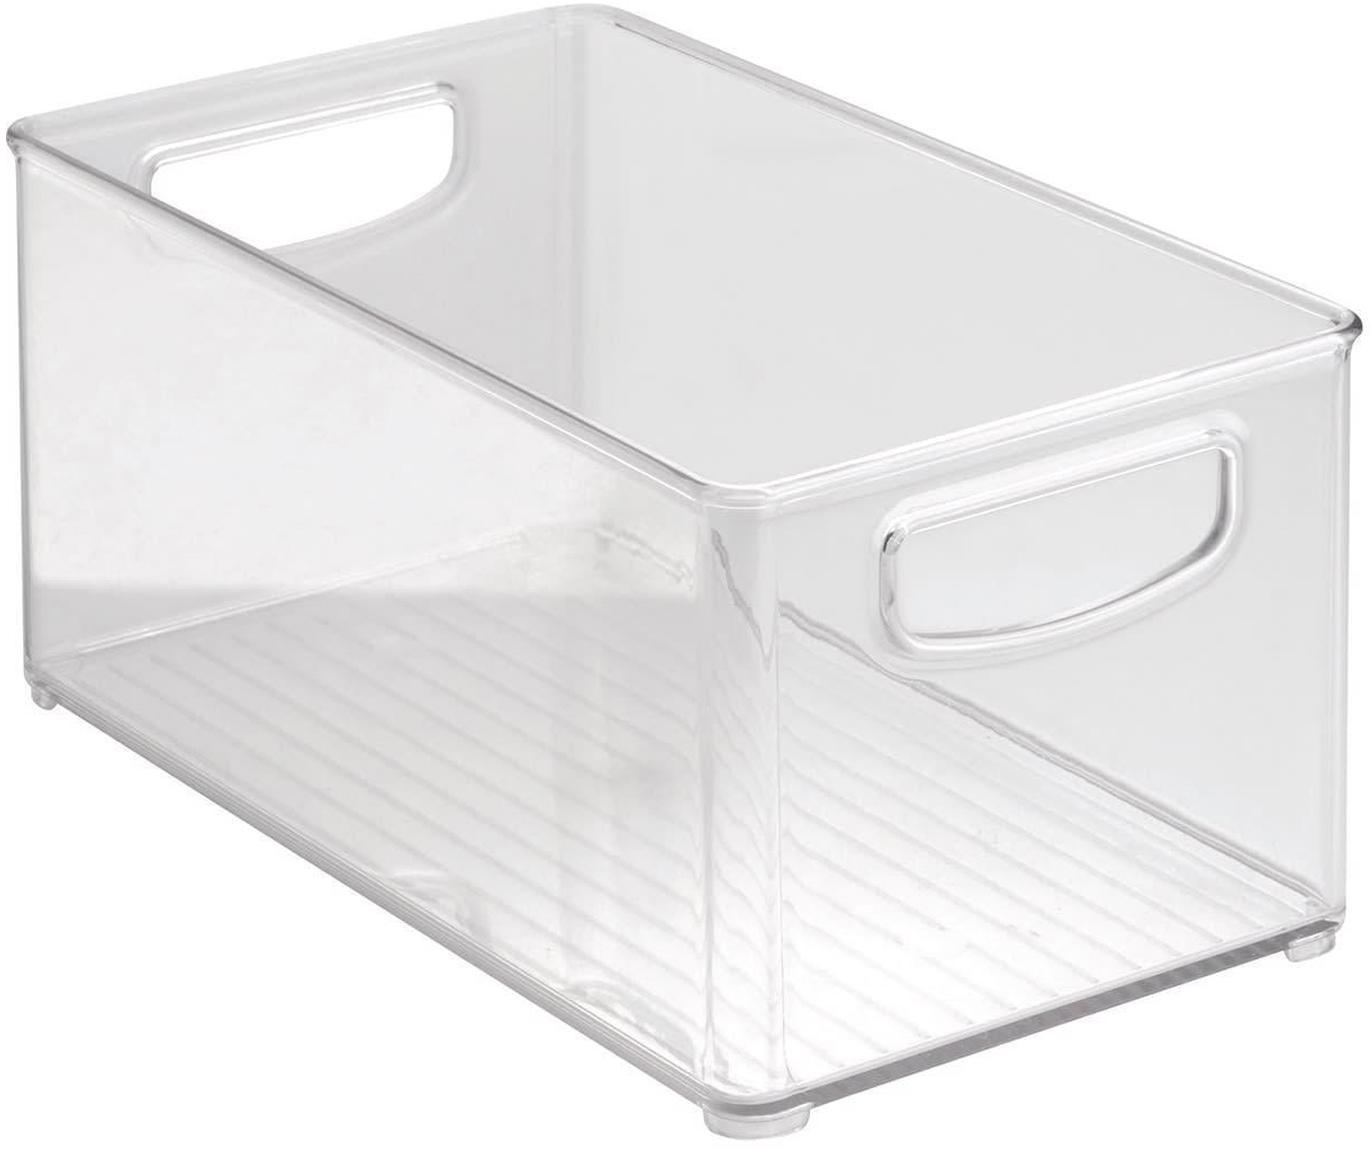 Organizador de cocina Linus, Acrílico, Transparente, An 15 x F 25 cm